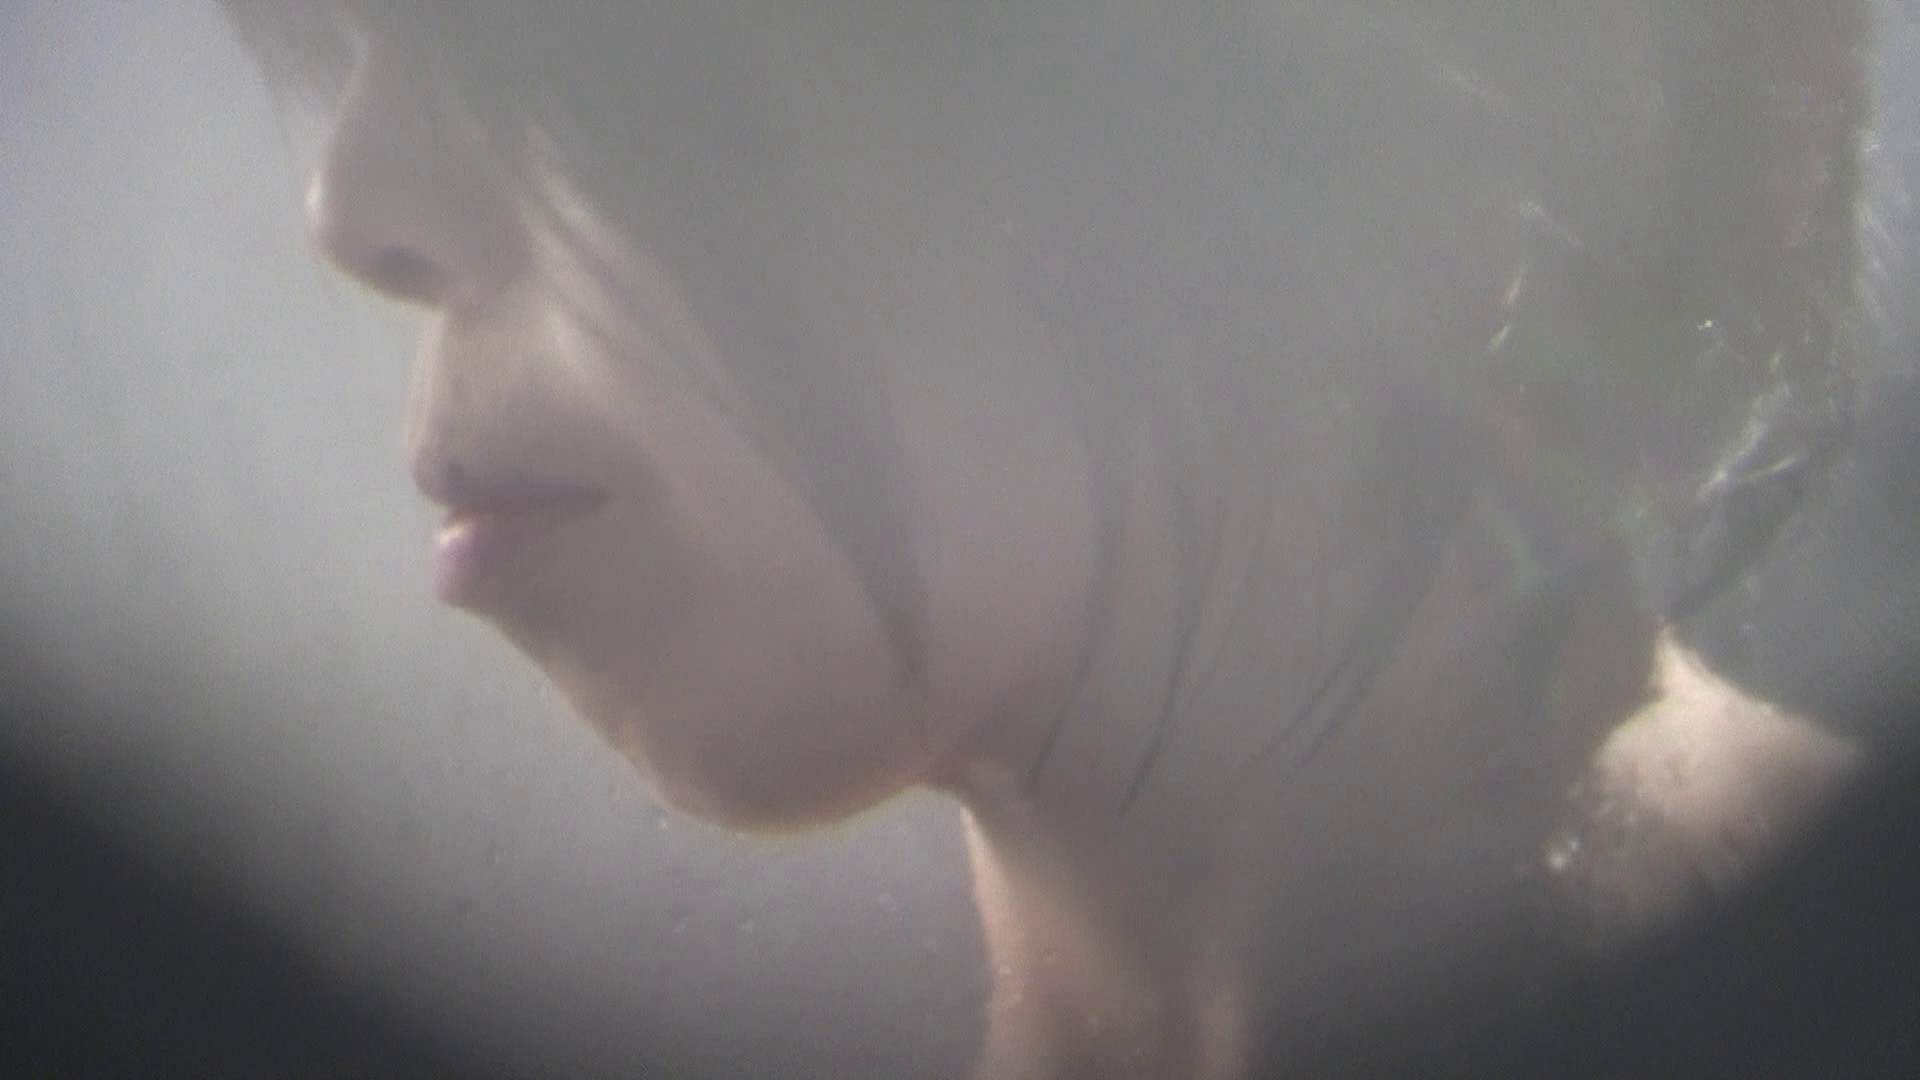 NO.11 年増の一本道!!中身ハミ出てます 丸見え オマンコ無修正動画無料 97画像 23